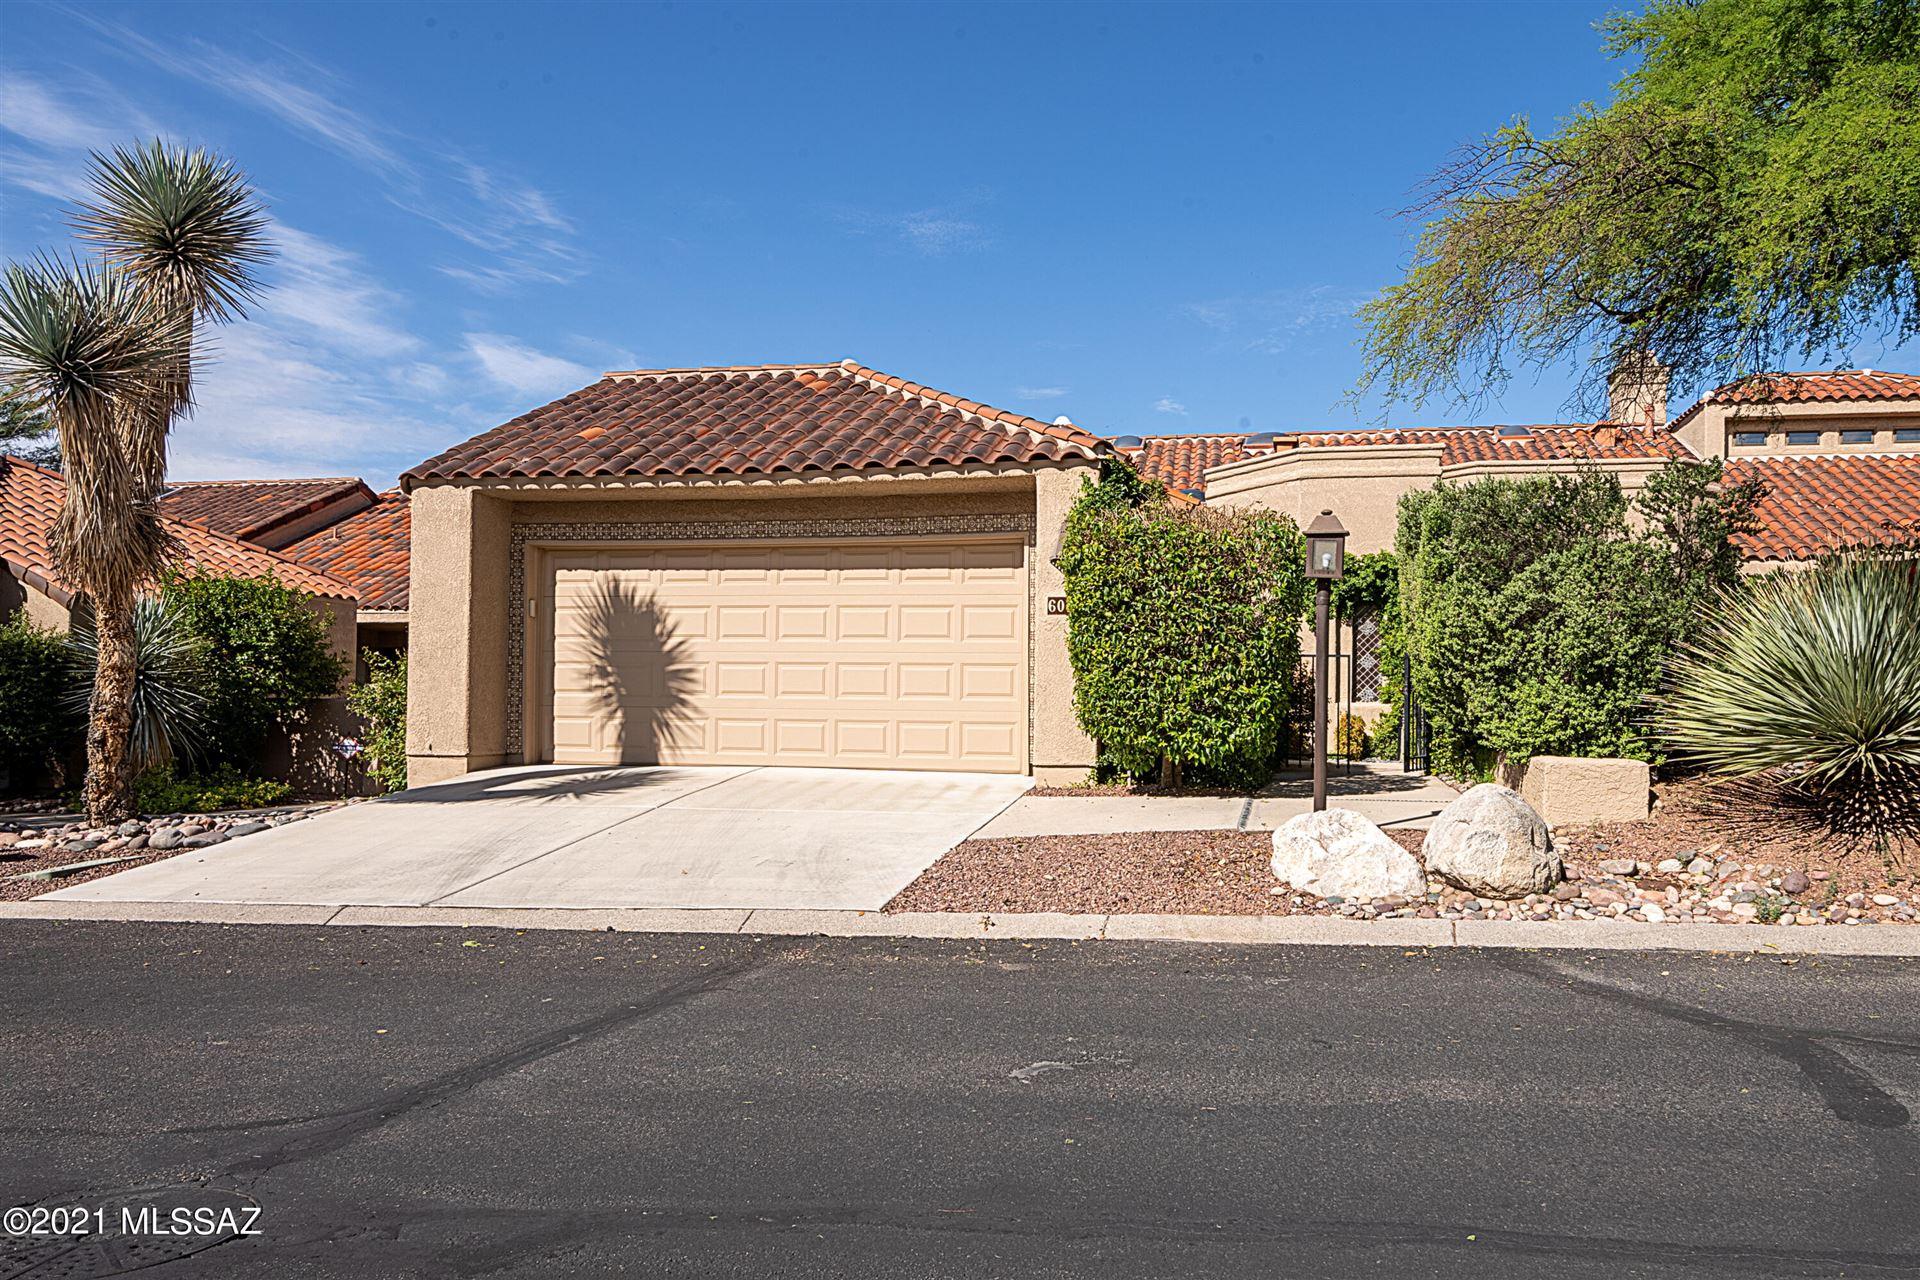 6079 N Golden Eagle Drive, Tucson, AZ 85750 - MLS#: 22123215